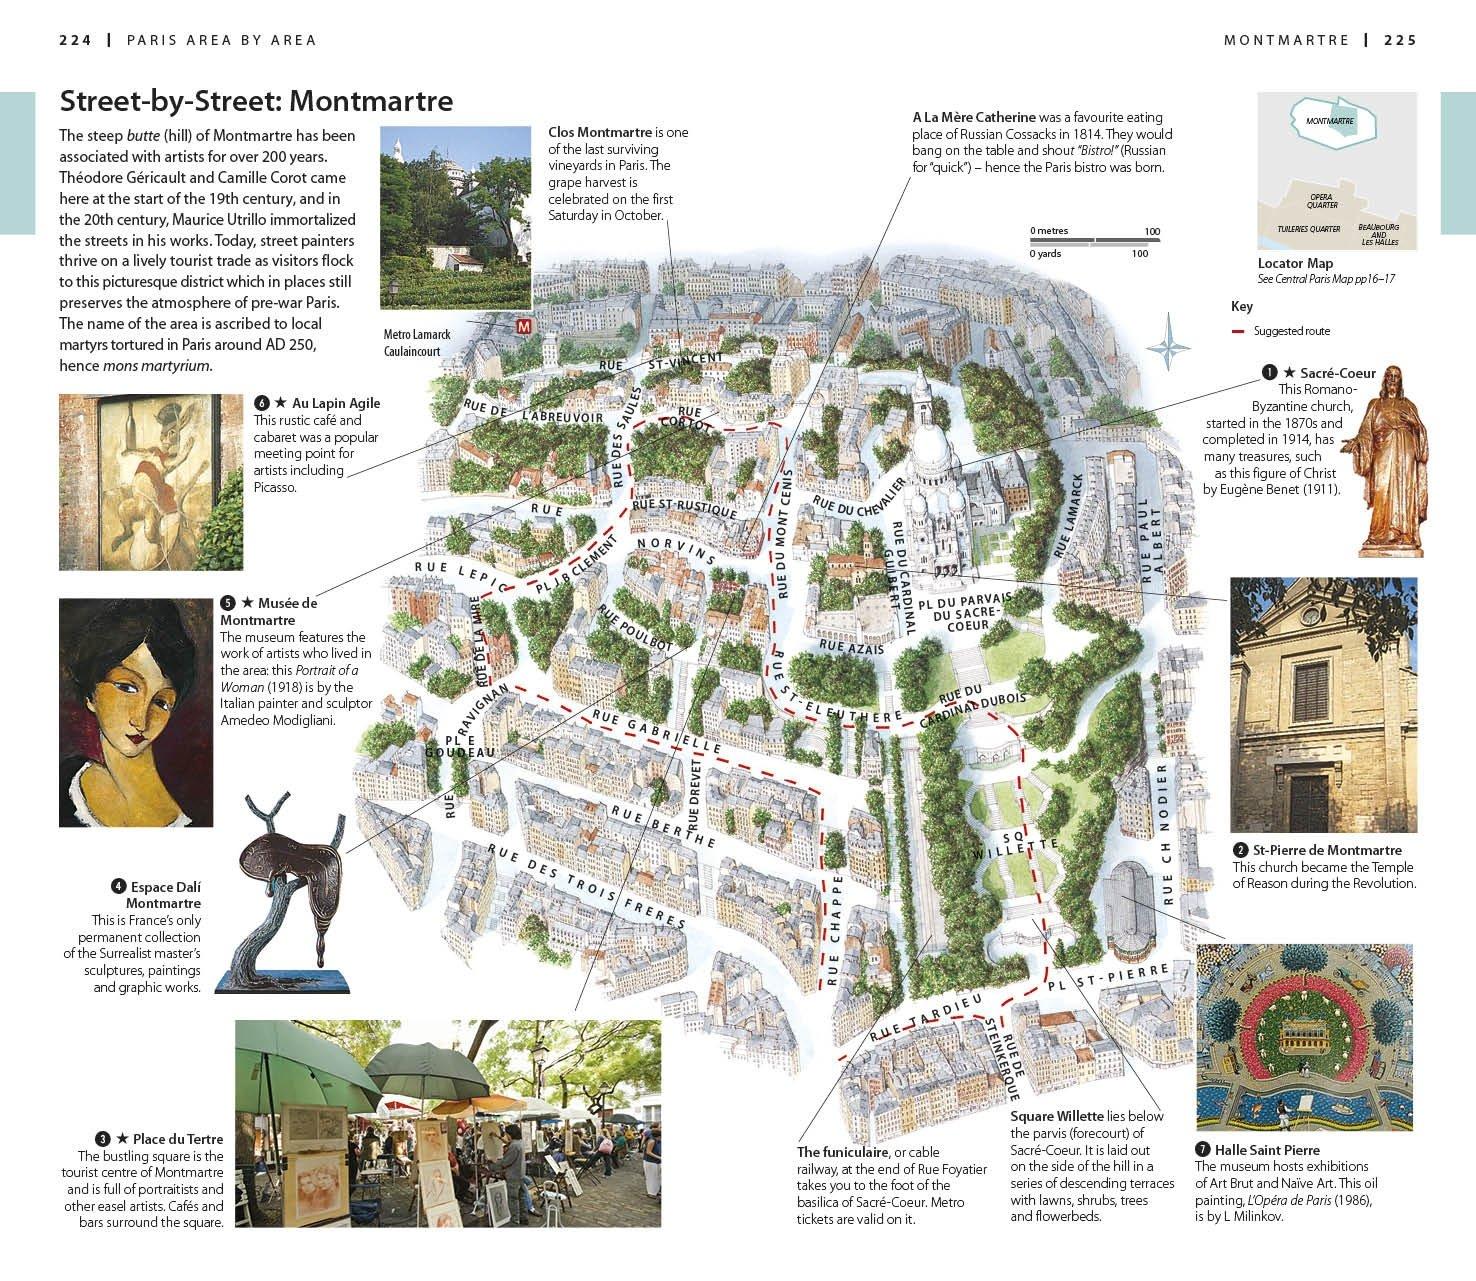 DK Eyewitness Travel Guide Paris DK Travel Amazon - What to see in paris map